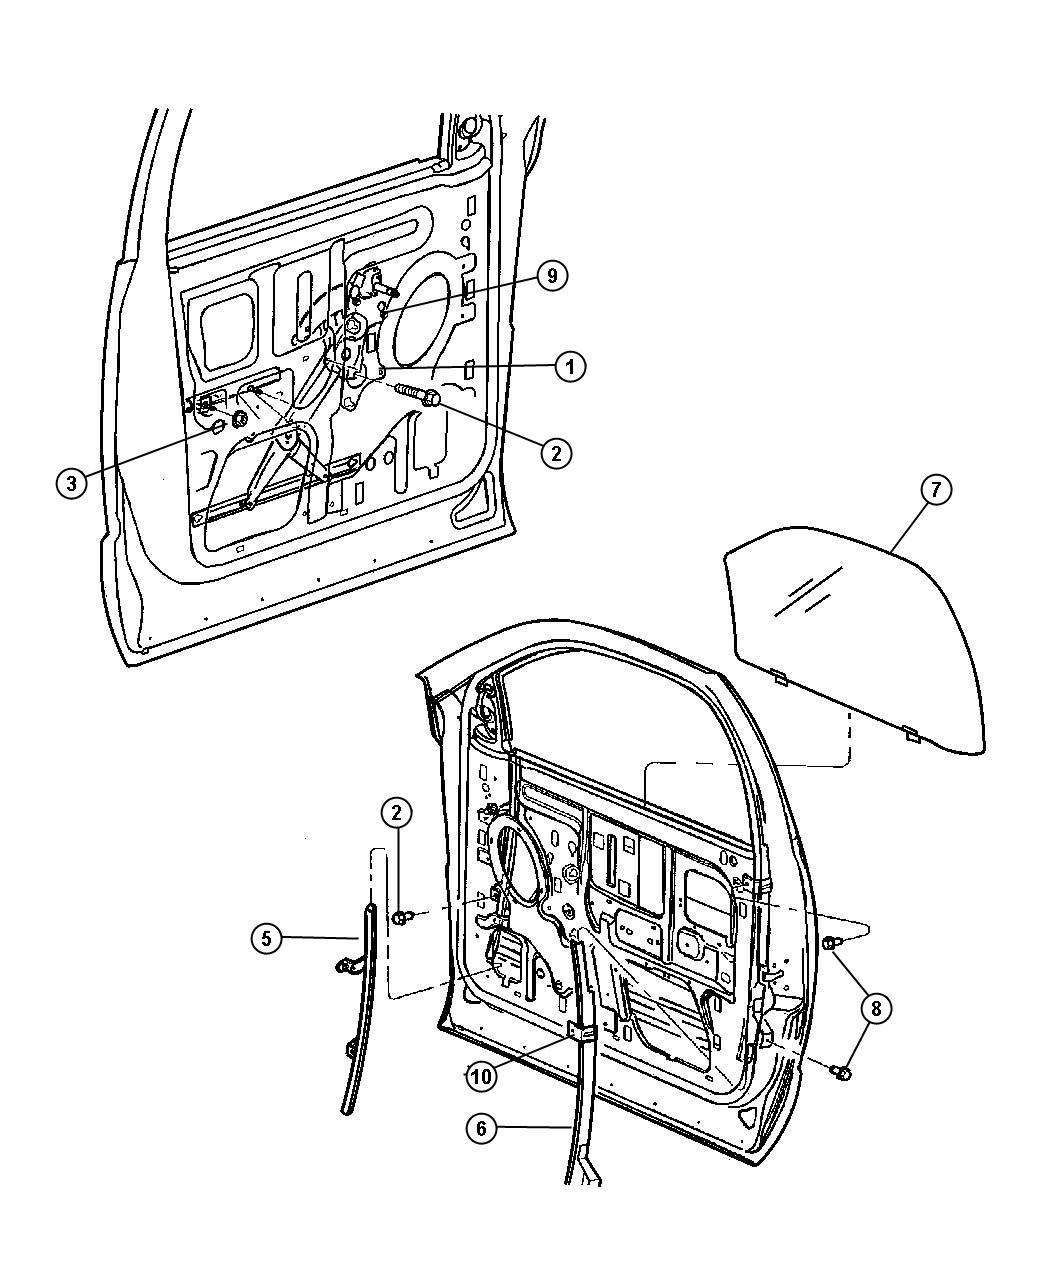 2004 Dodge Ram 1500 Handle. Window regulator. Used for